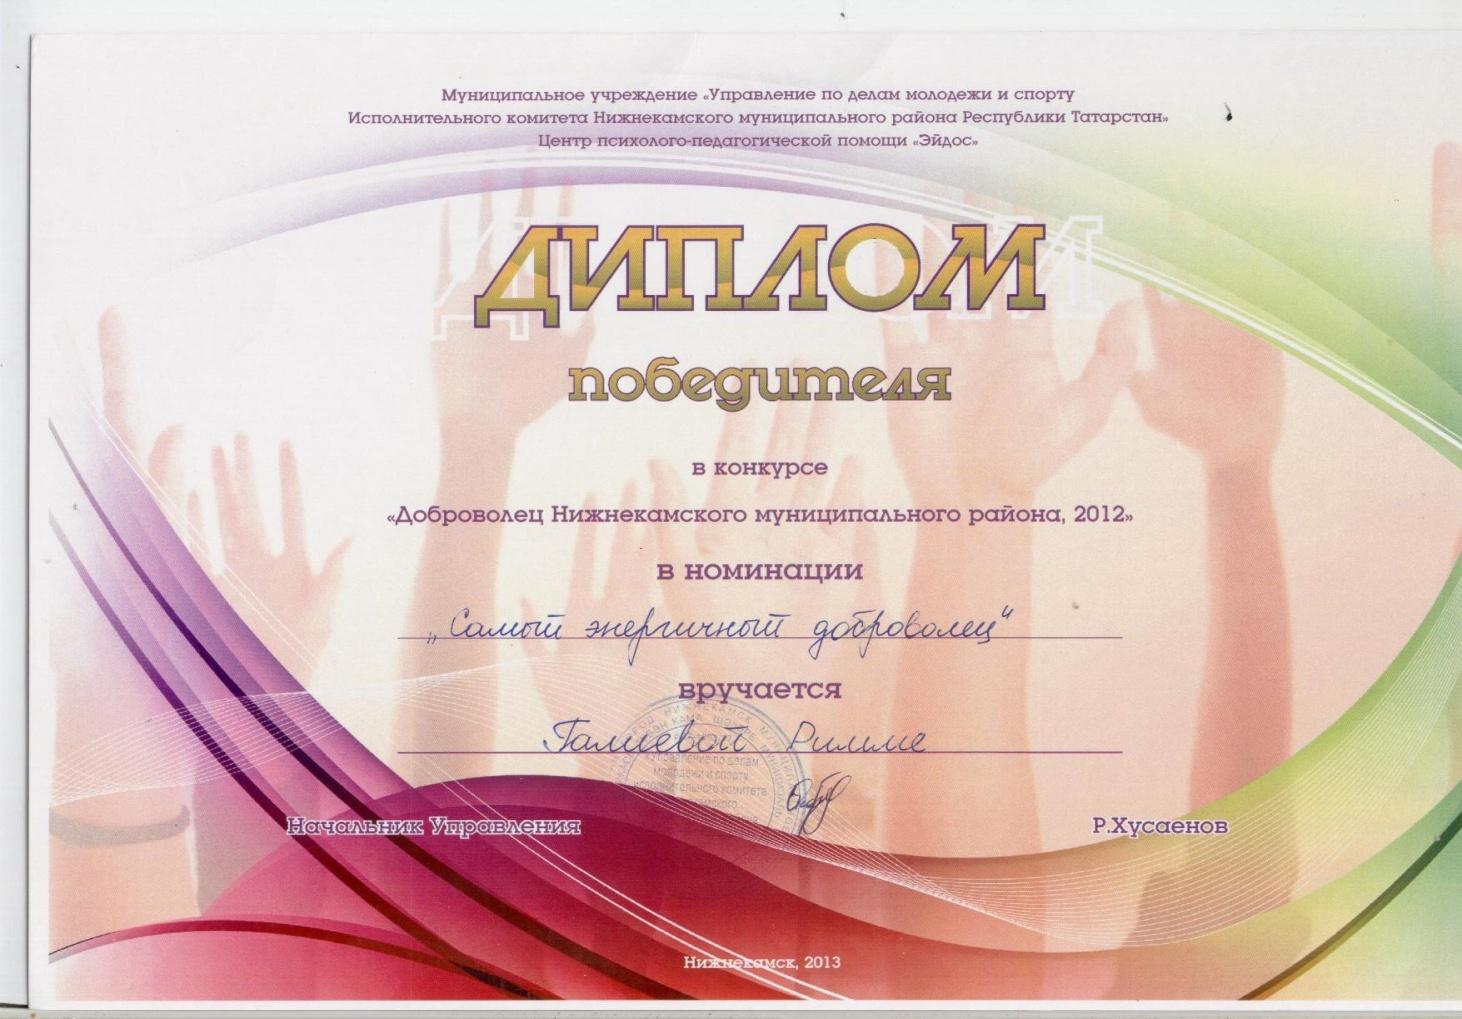 F:\Всероссйский конкурс Портфолио выпускника\РИММА\Римма 005.jpg